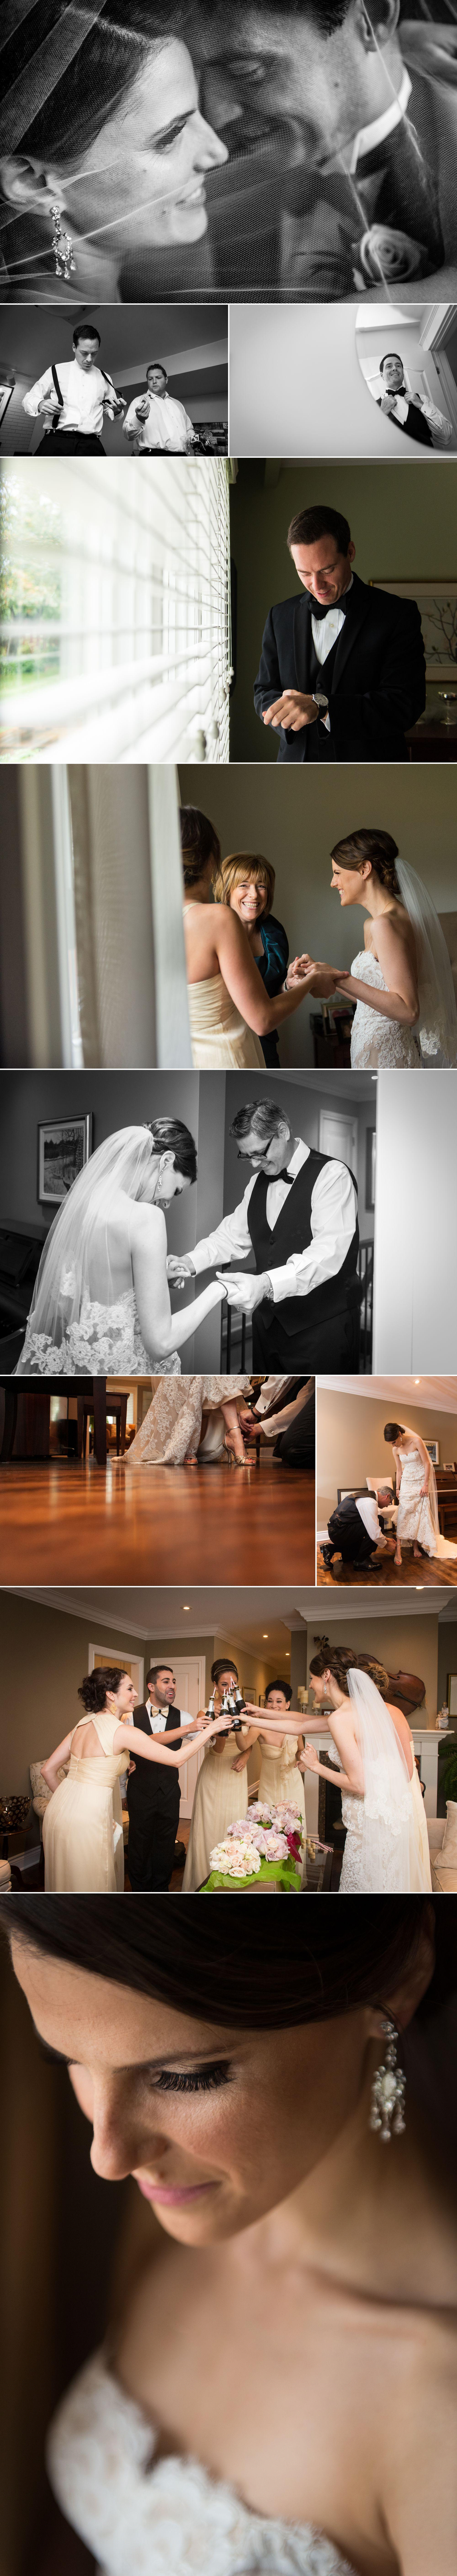 Luxury wedding photographs.